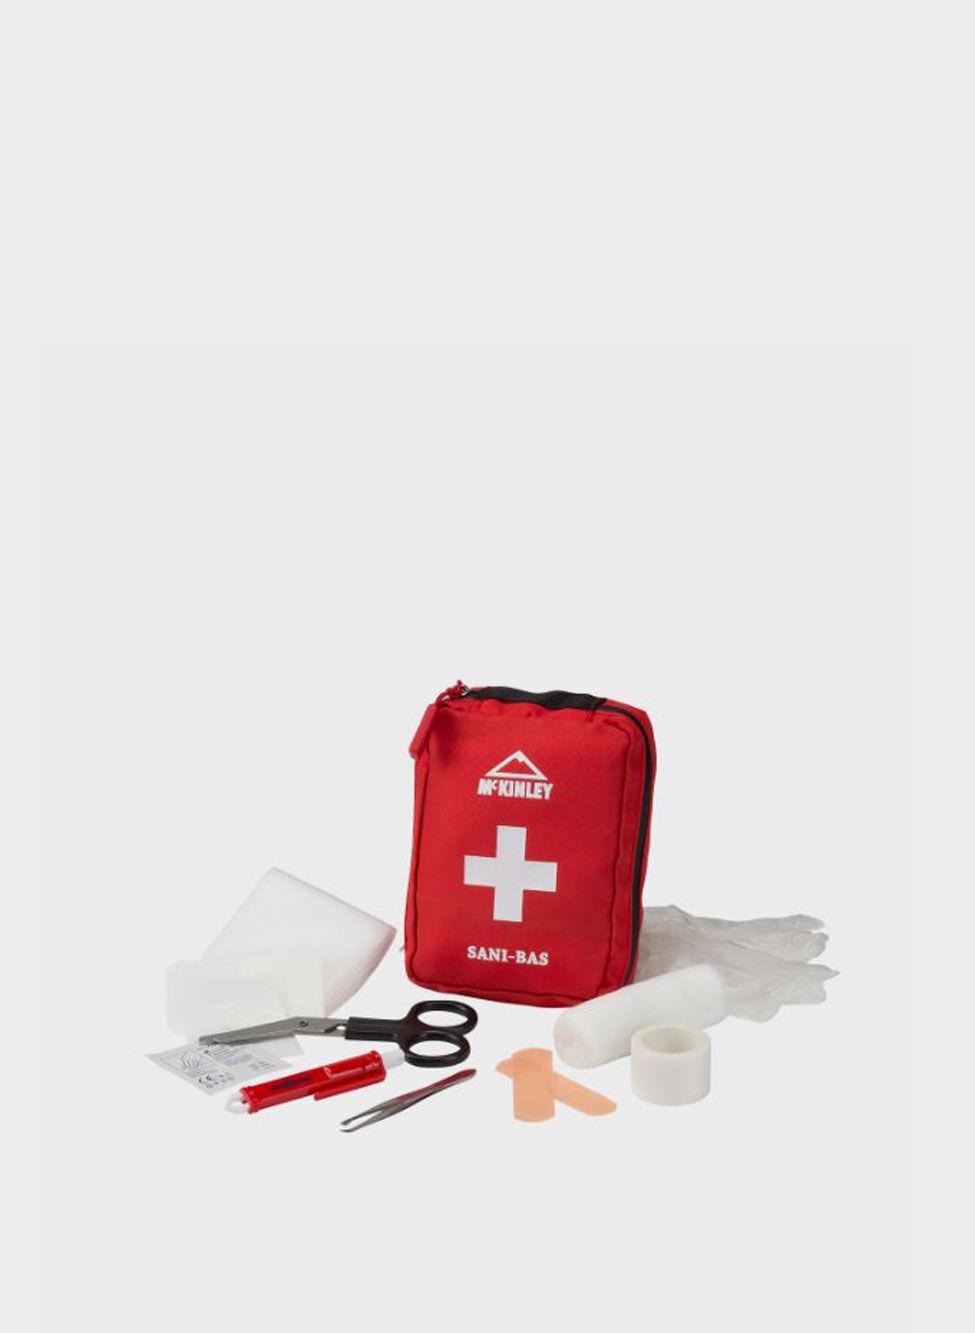 FIRST AID KIT SANI BAS kit prontosoccorso